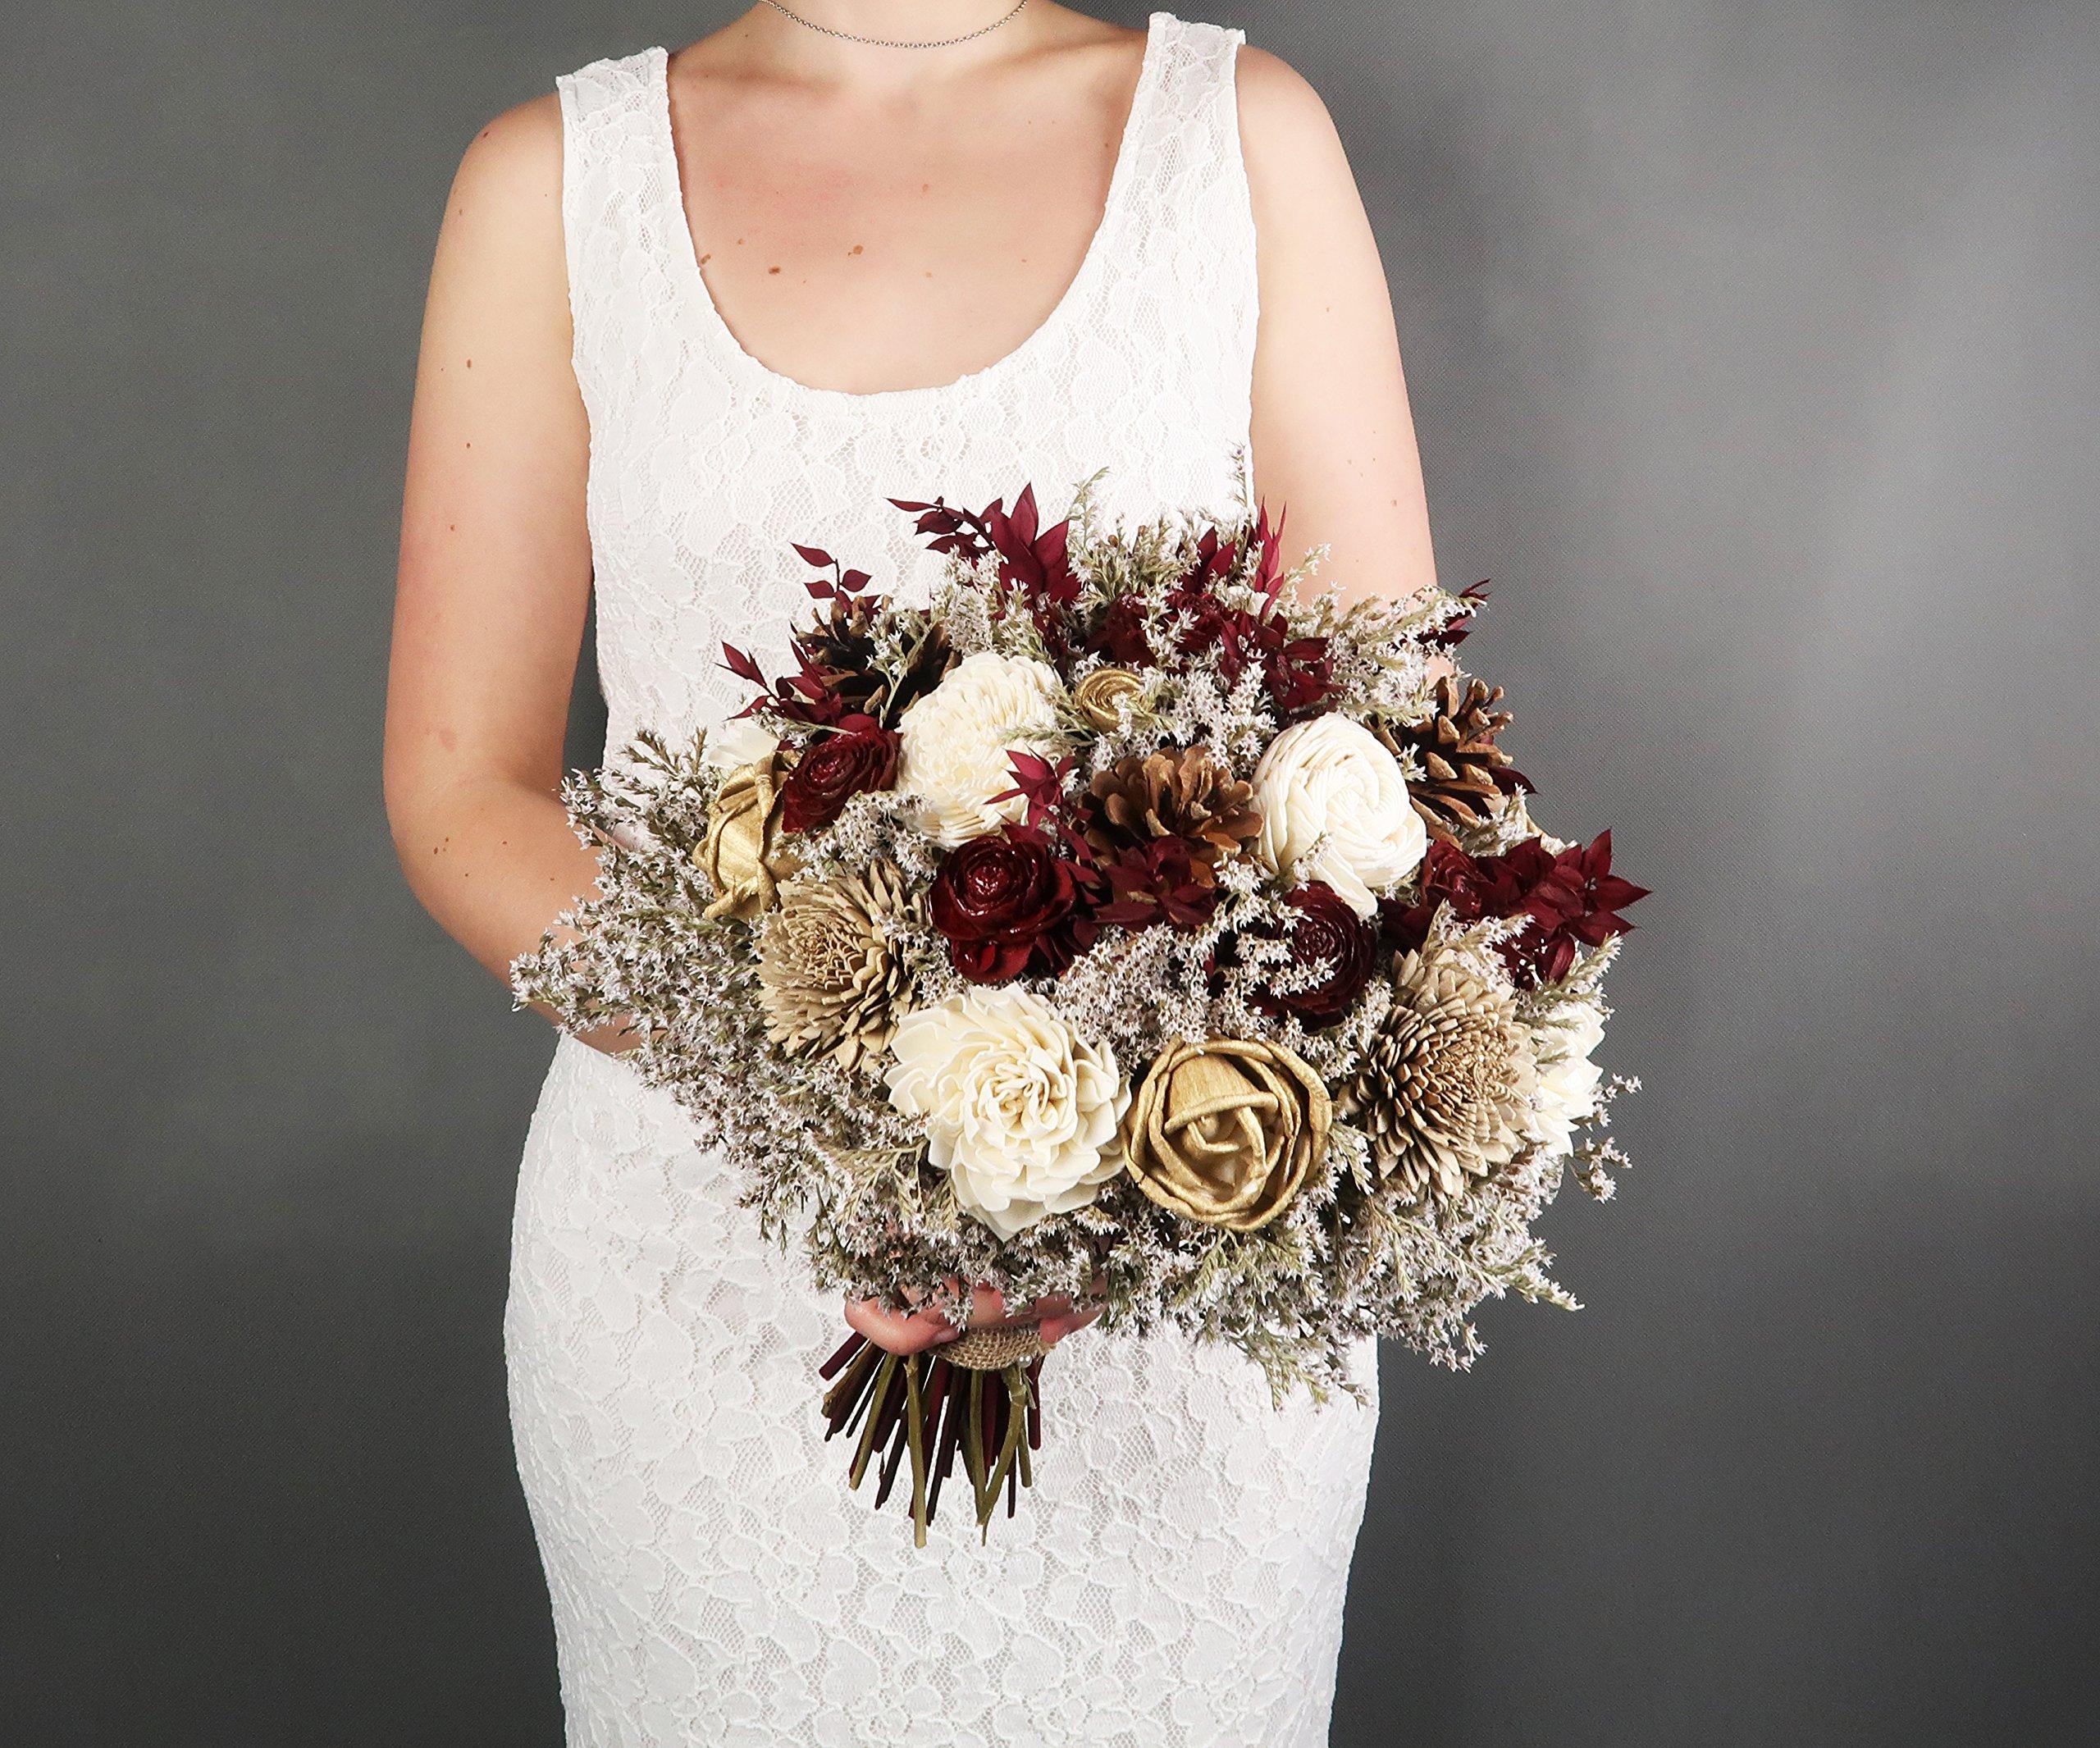 Bridal-Bouquet-Ivory-Brown-Burgundy-Gold-Pine-Cone-Sola-Flowers-Rustic-Woodland-Autumn-Winter-Wedding